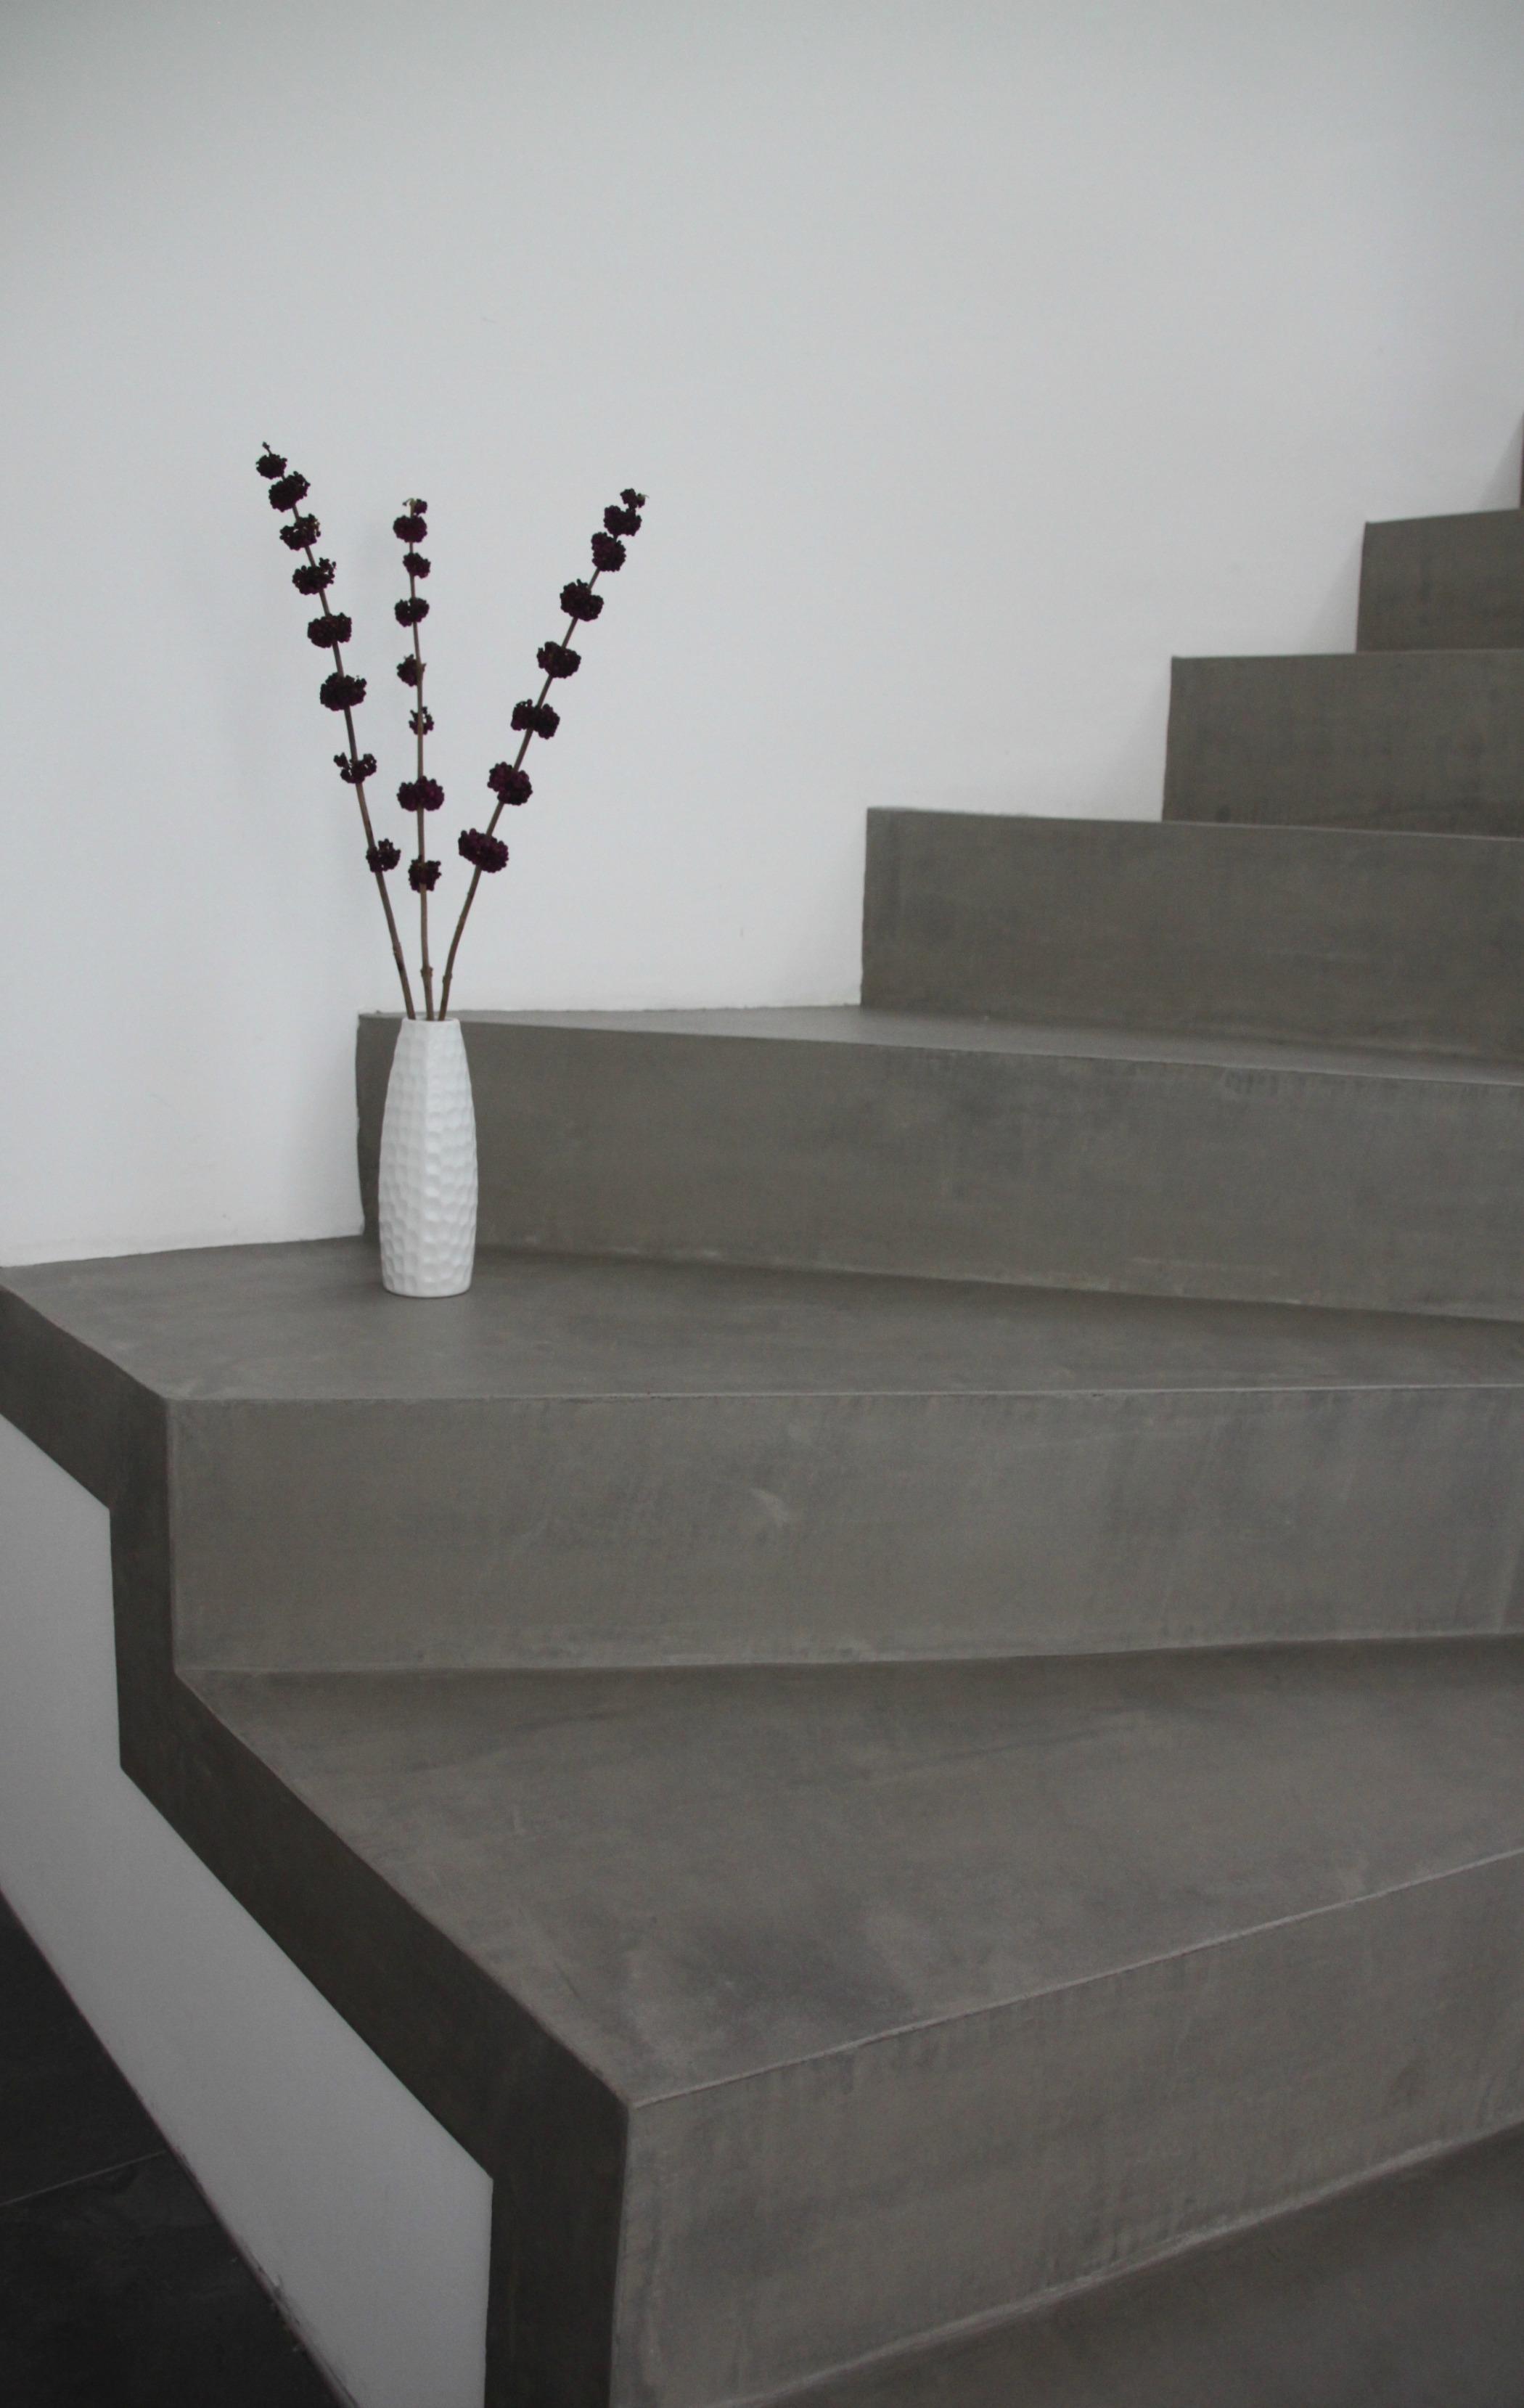 Betontreppe Innen treppenaufgang bilder ideen couchstyle